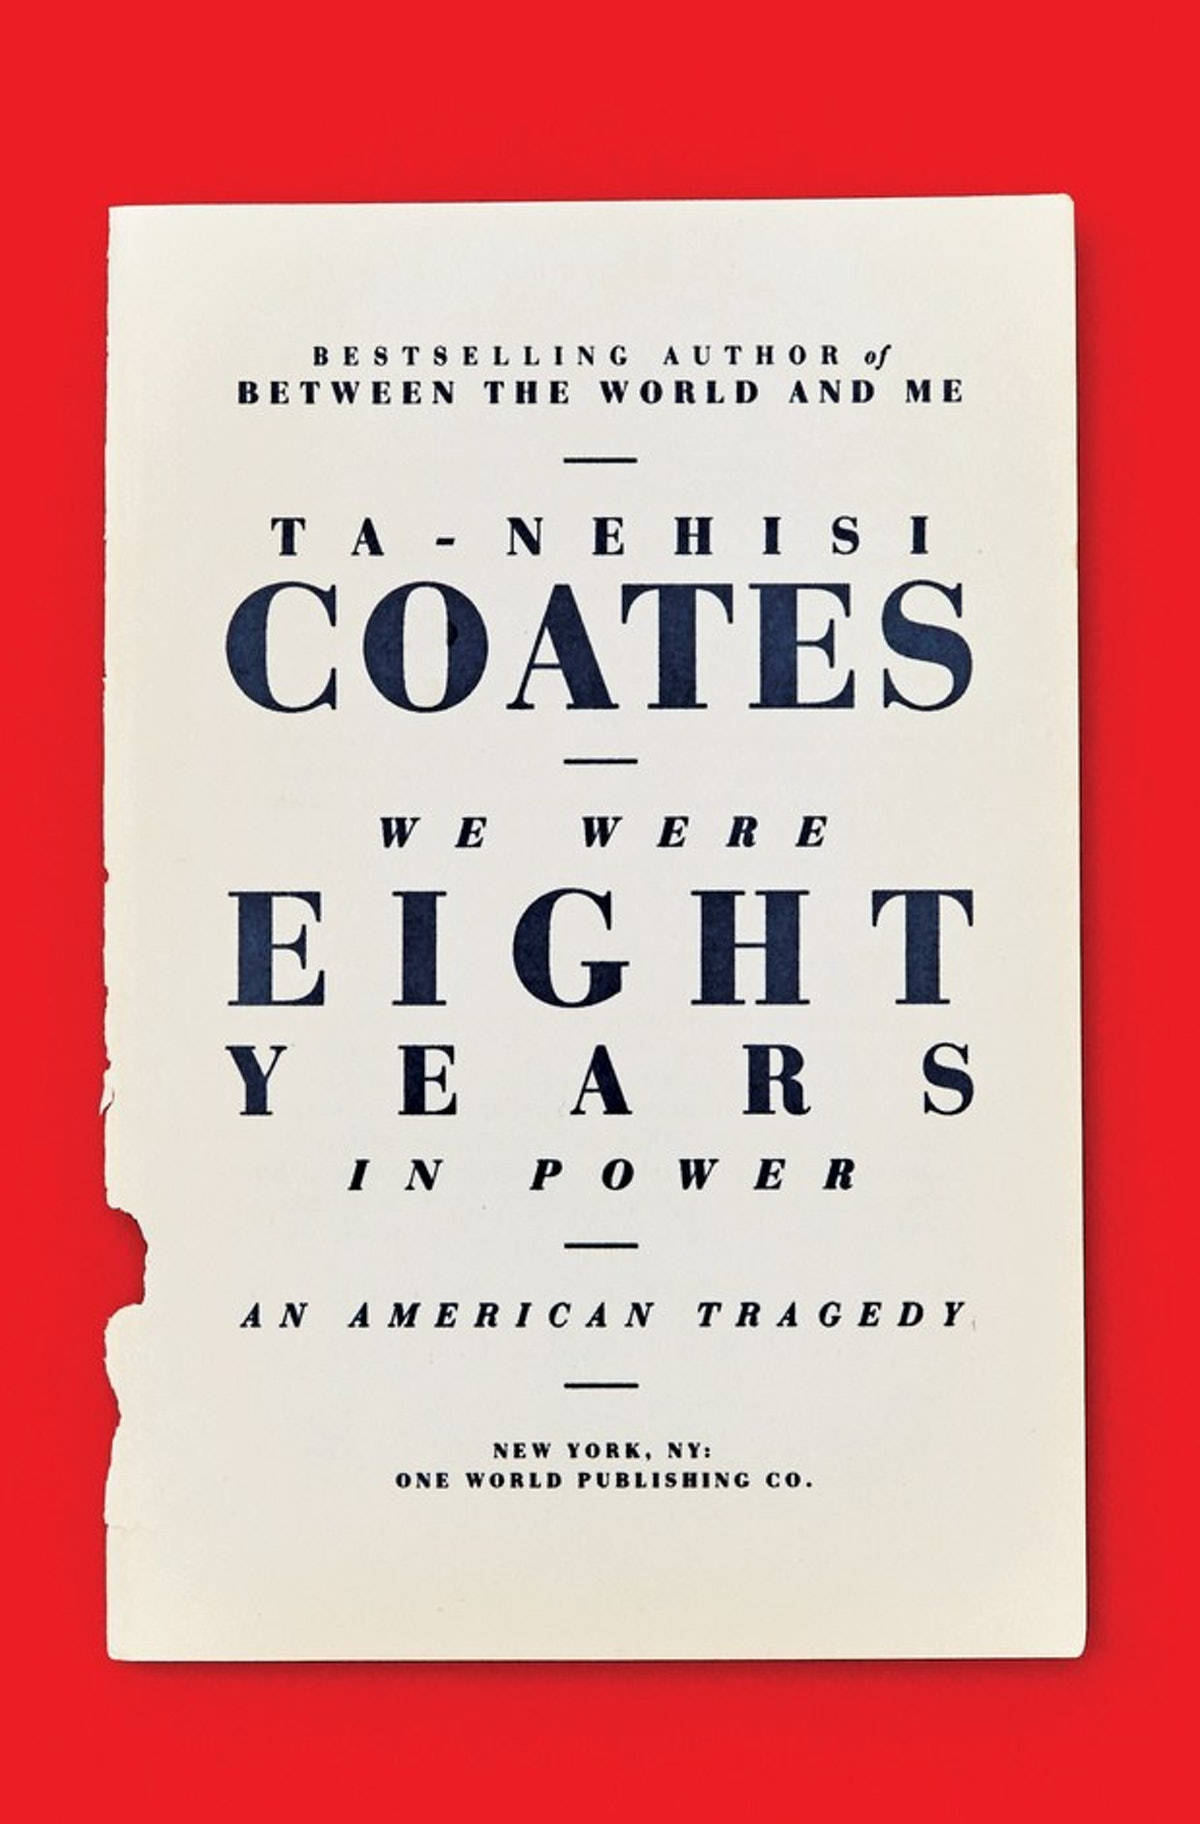 Ta-Nehisi Coates - We Were Eight Years in Power.jpg